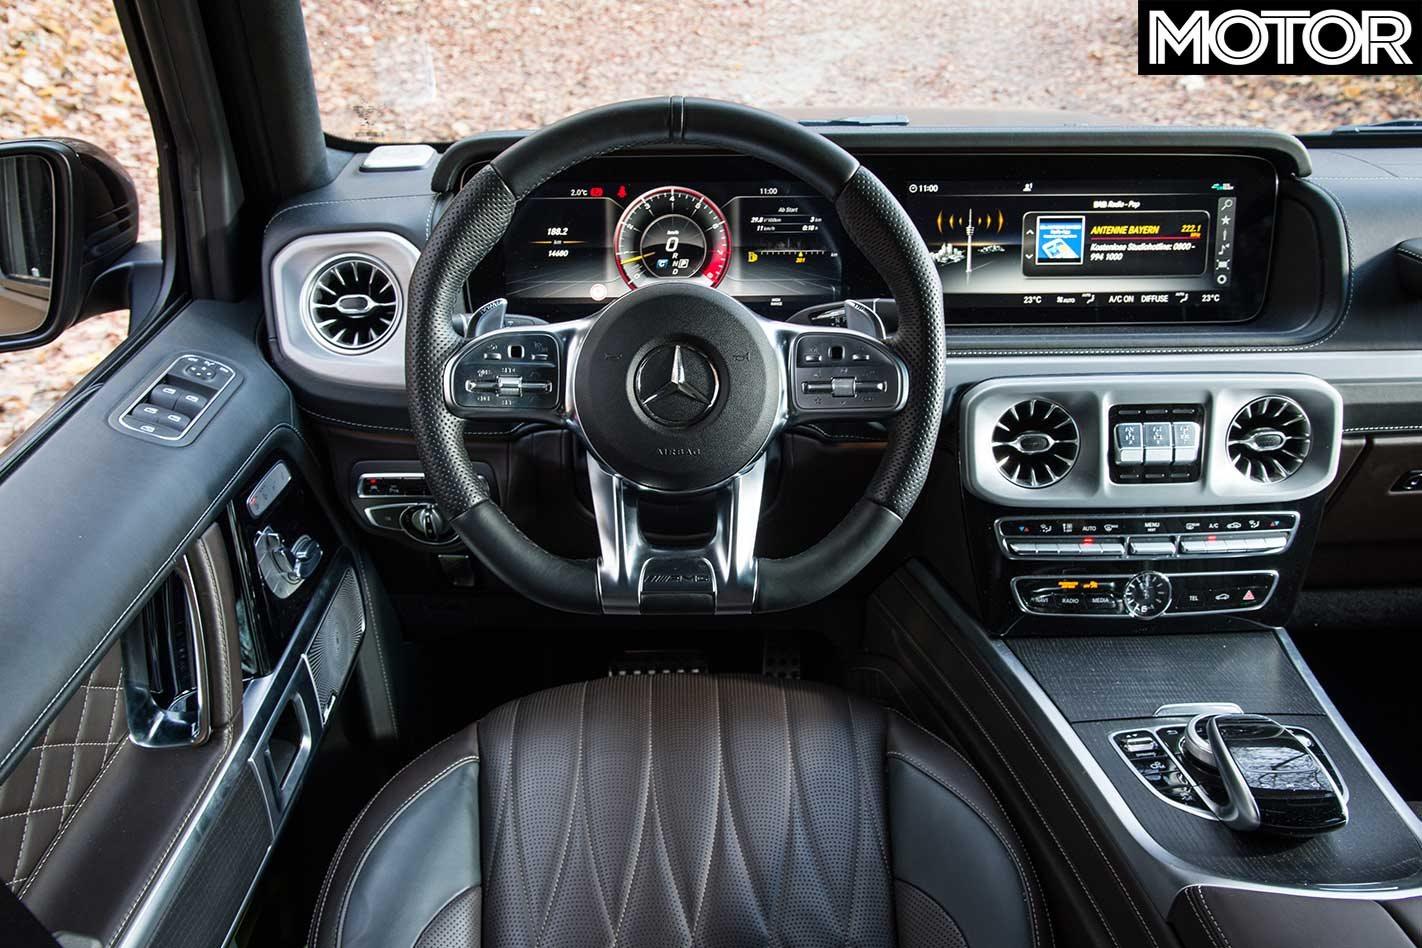 2019 Lamborghini Urus vs Mercedes-AMG G63 vs Range Rover comparison